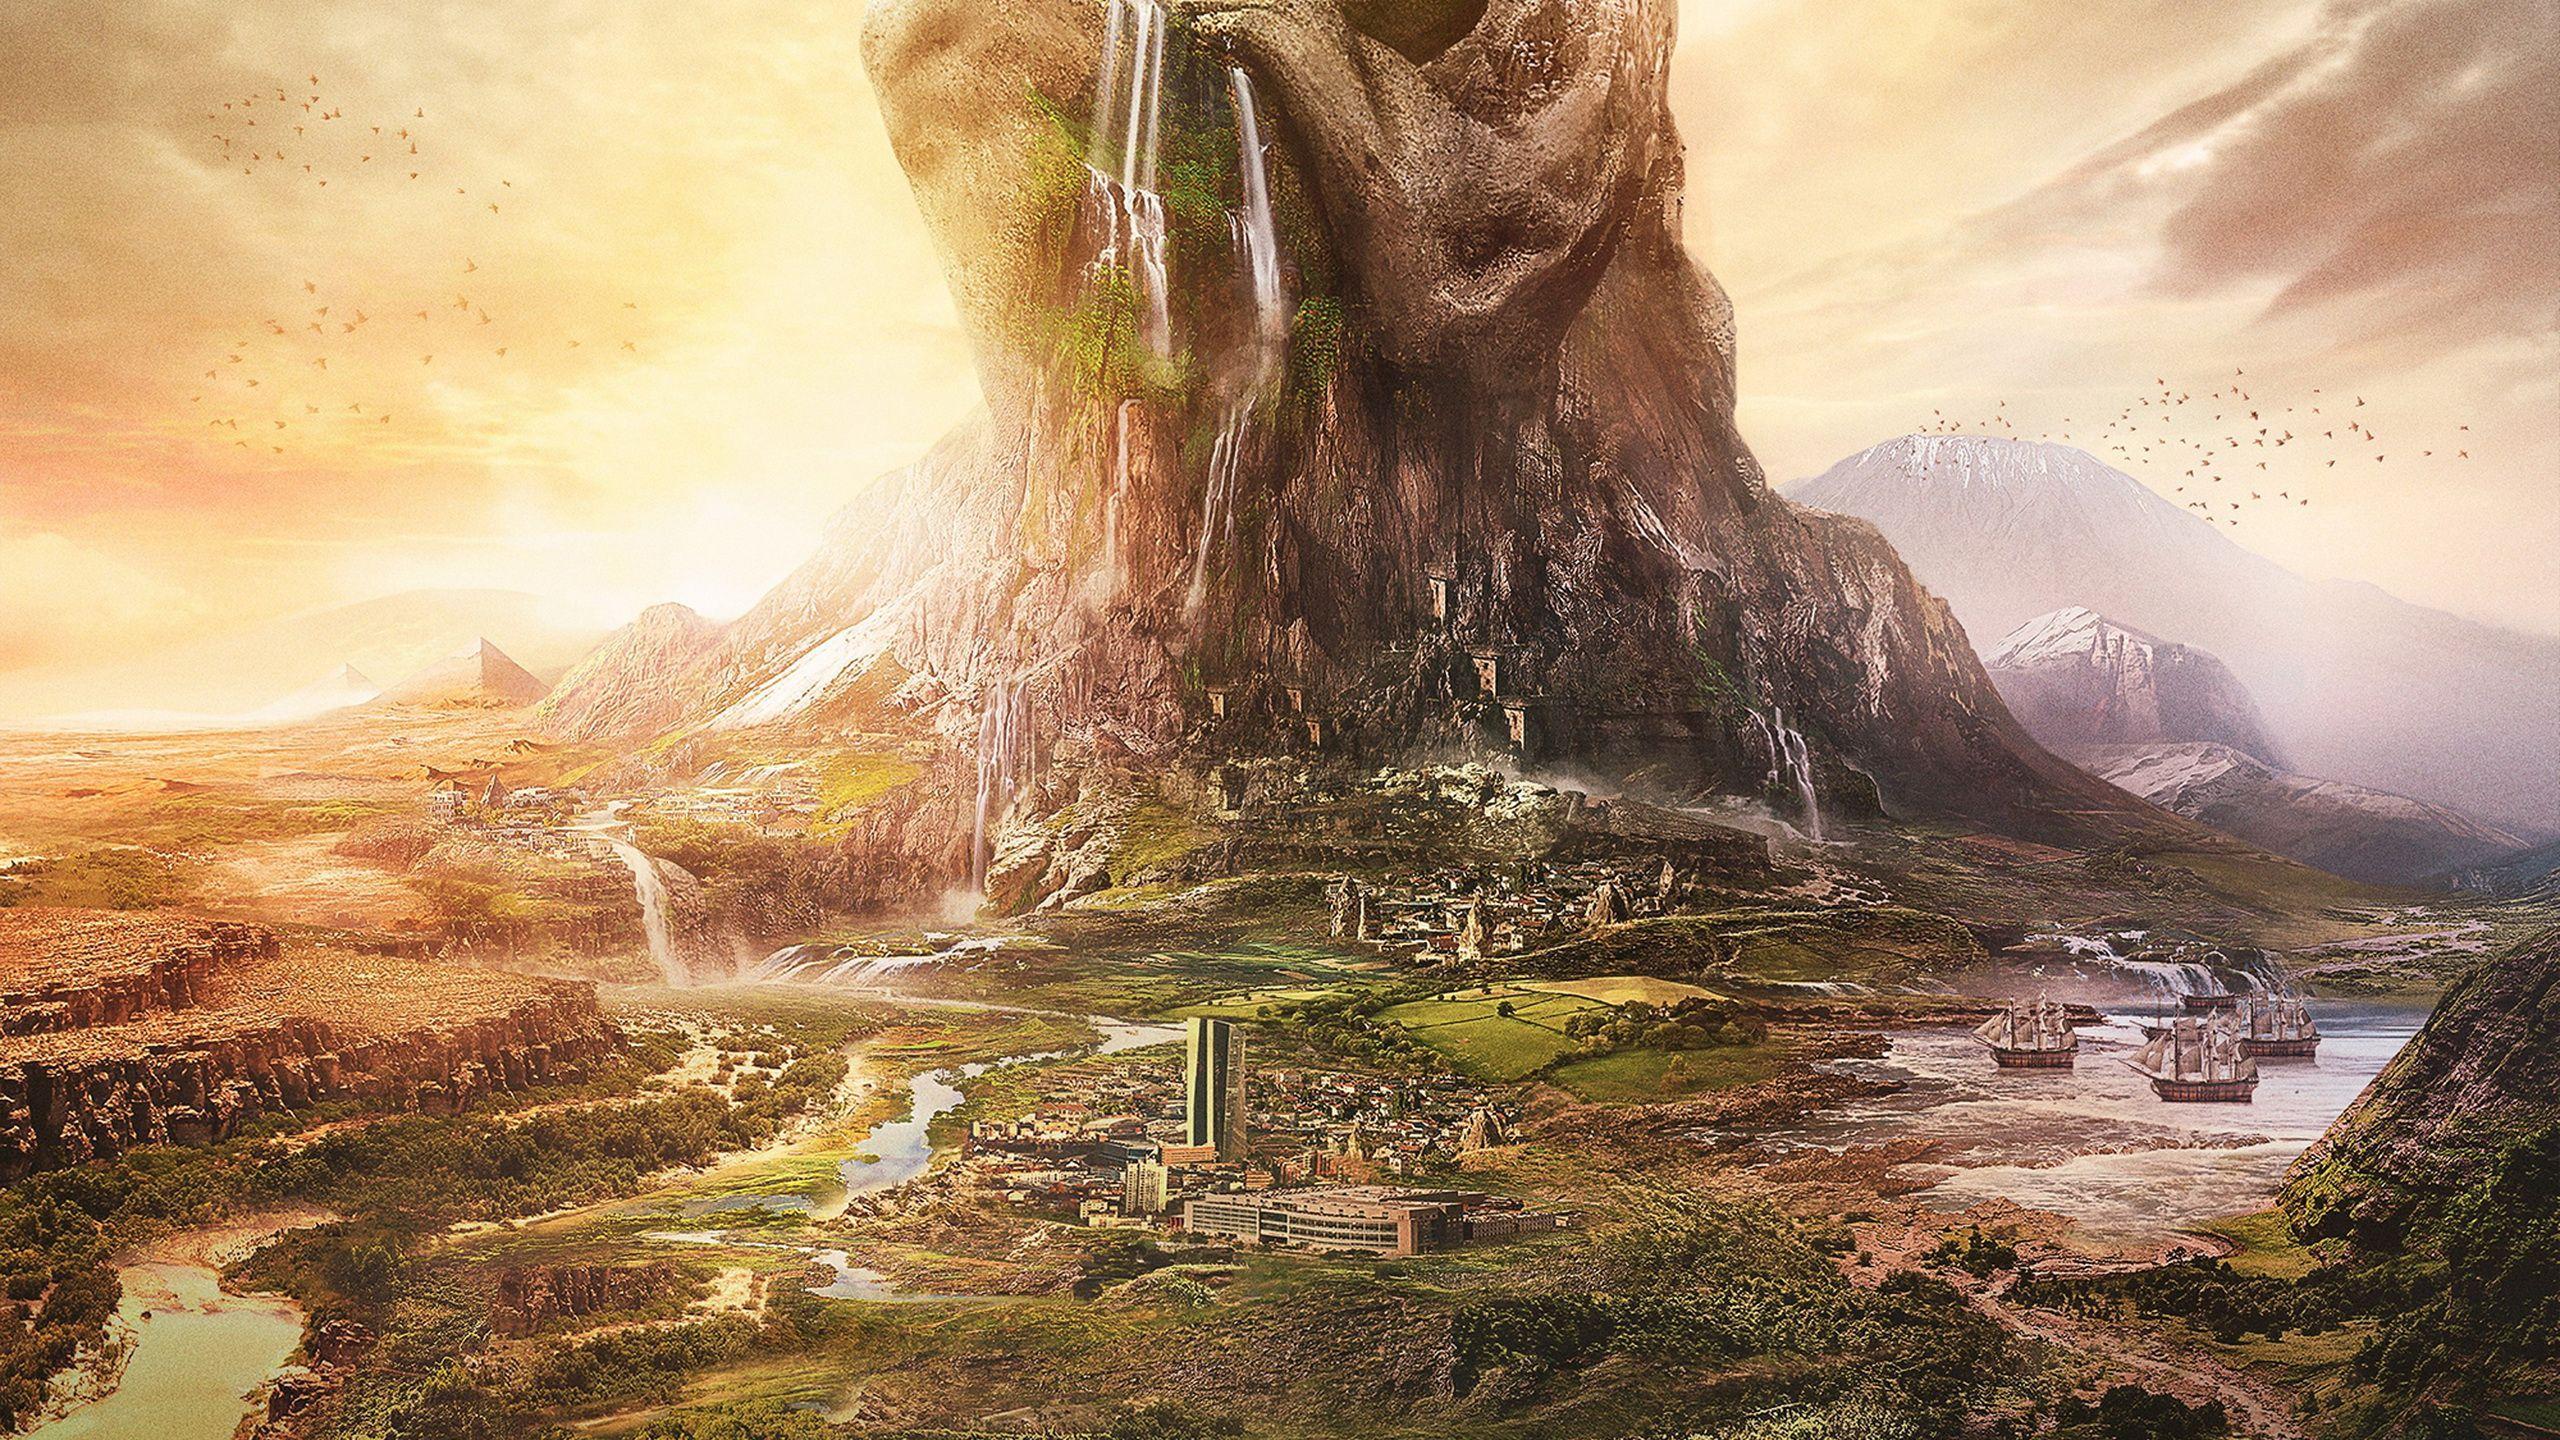 Civilization Wallpapers Top Free Civilization Backgrounds